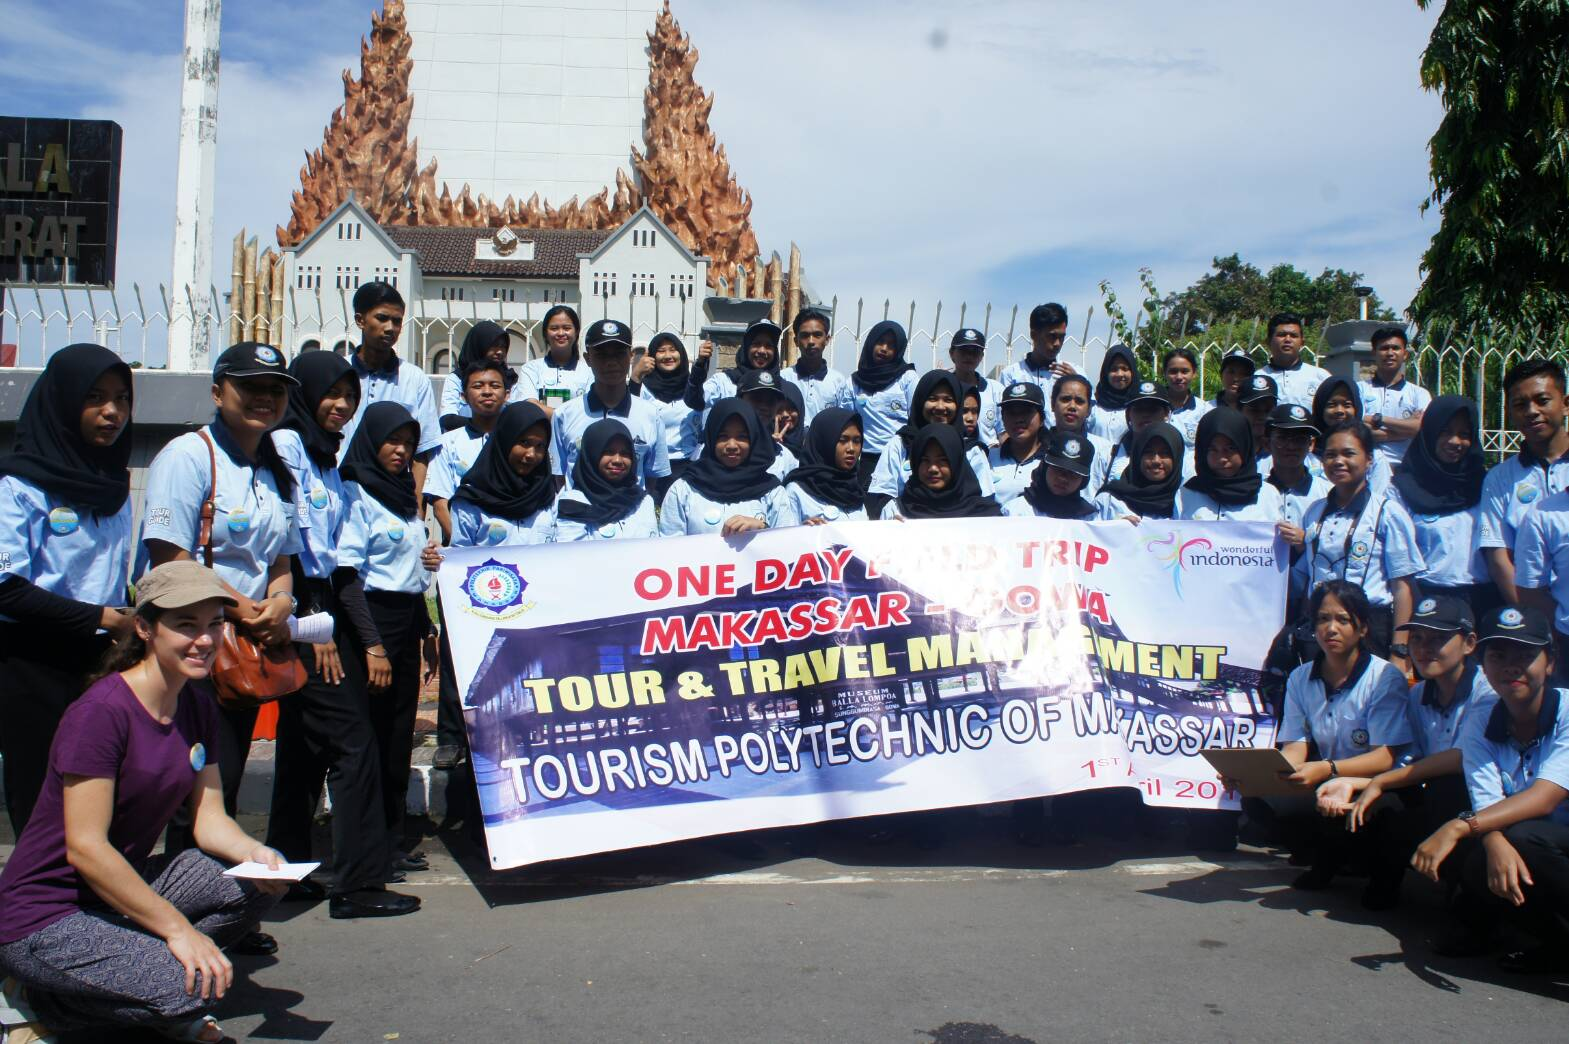 Day Field Trip Makassar Gowa Monumen Mandala Weeldameisti Kala Ditetapkan